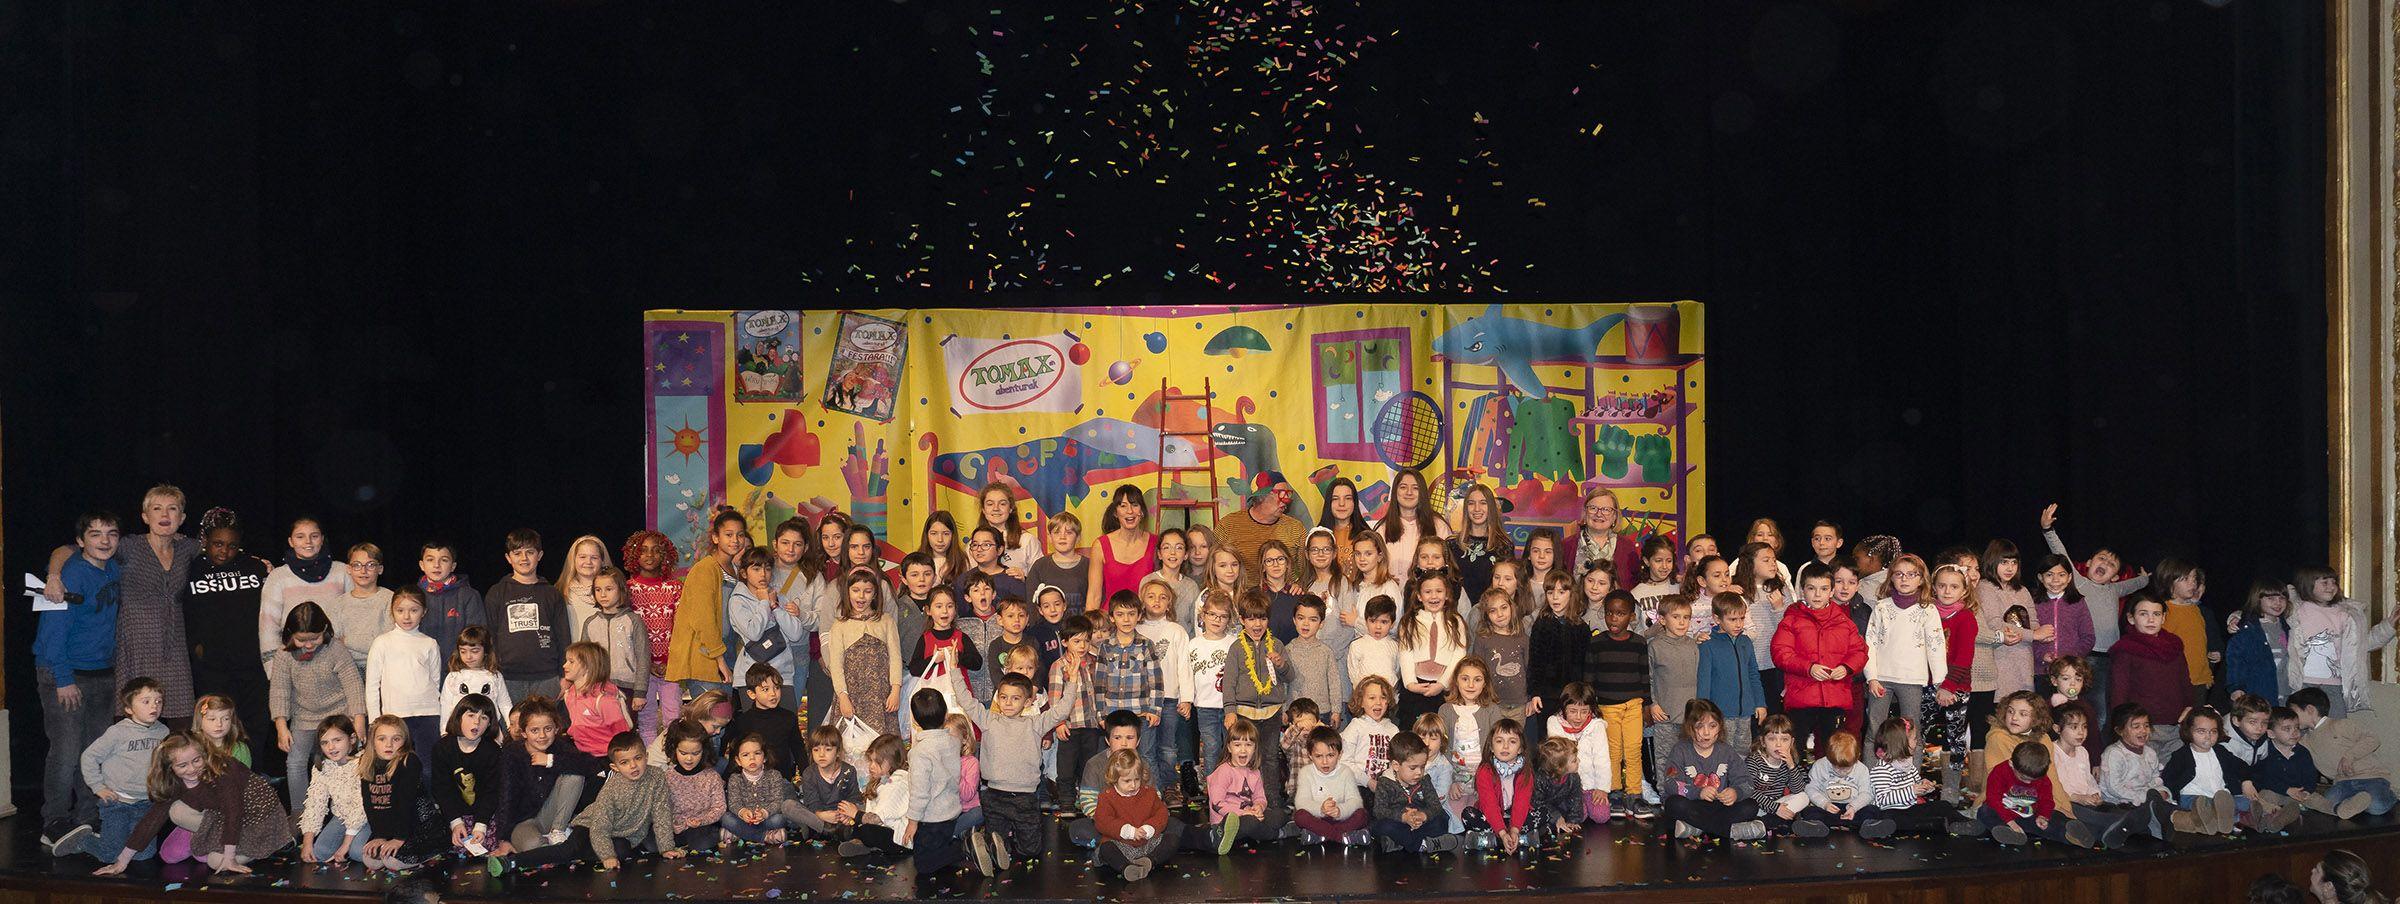 Foto de Foto de familia en la fiesta infantil del COEGI celebrada en